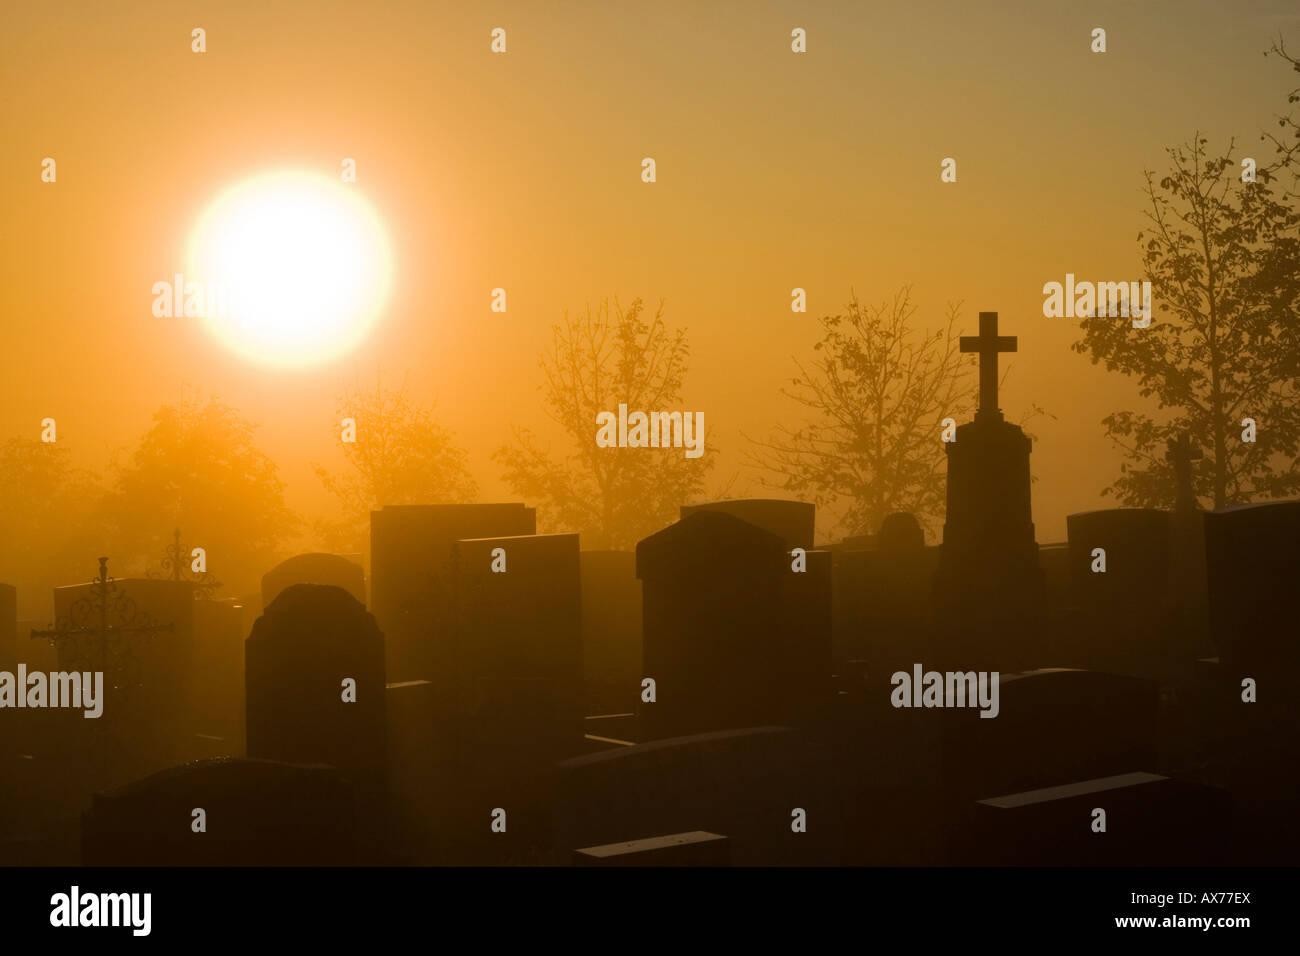 Germany, Bavaria, Hohenpeißenberg, Grave yard at dawn - Stock Image